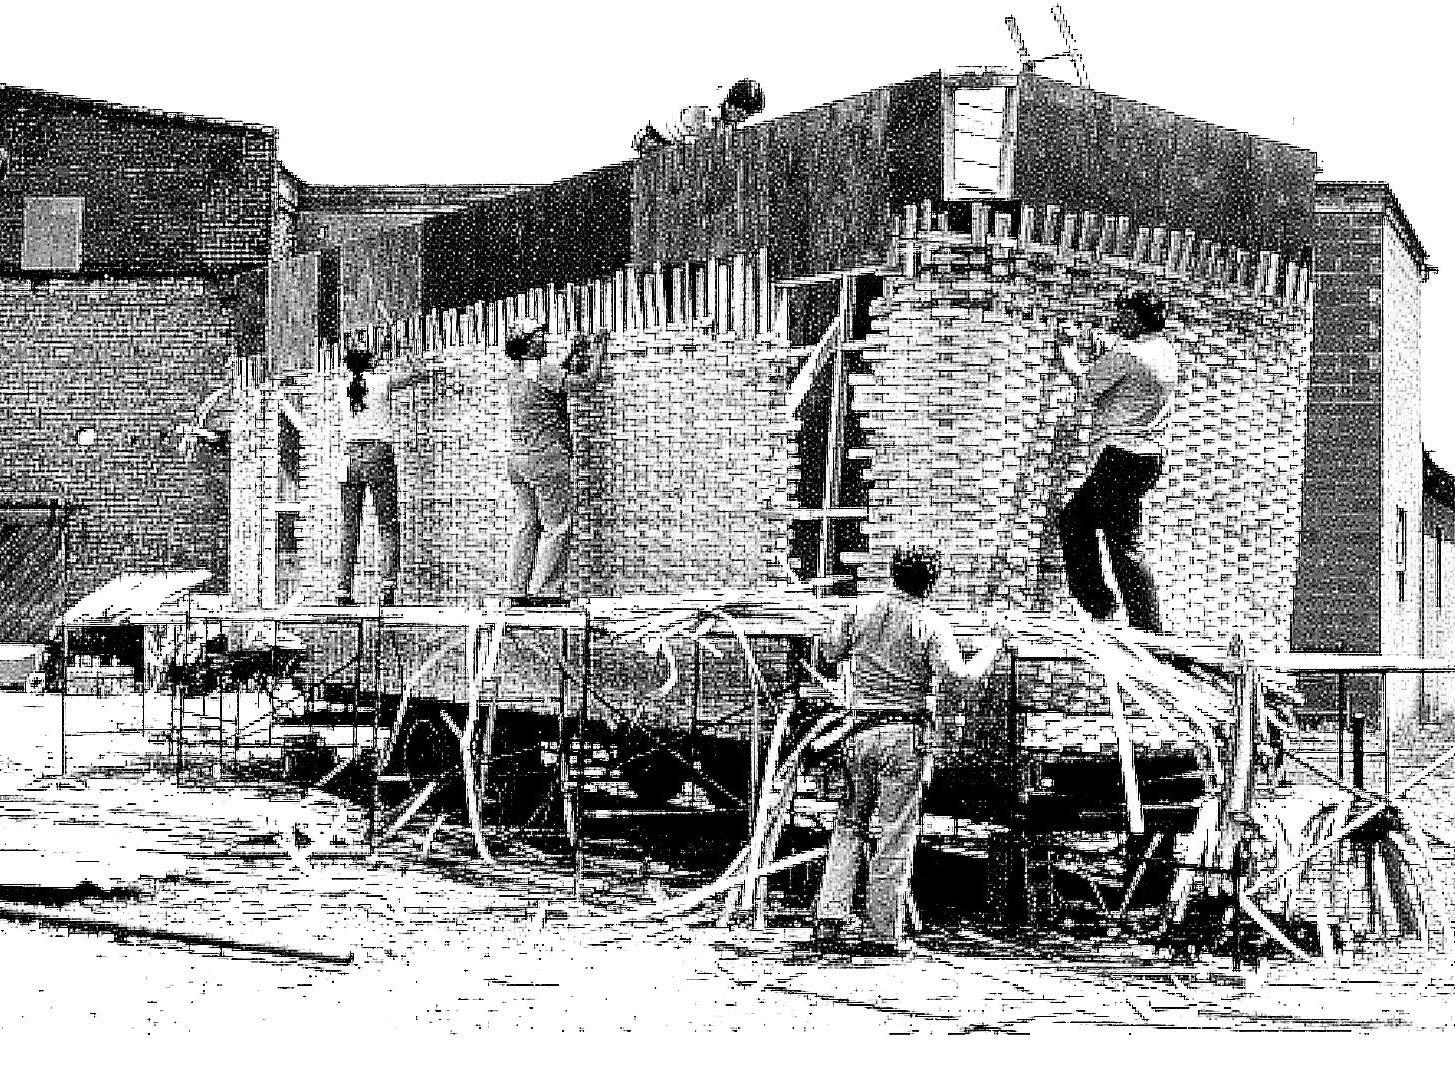 Weavers in Dresden work on a larger than average Longaberger basket.